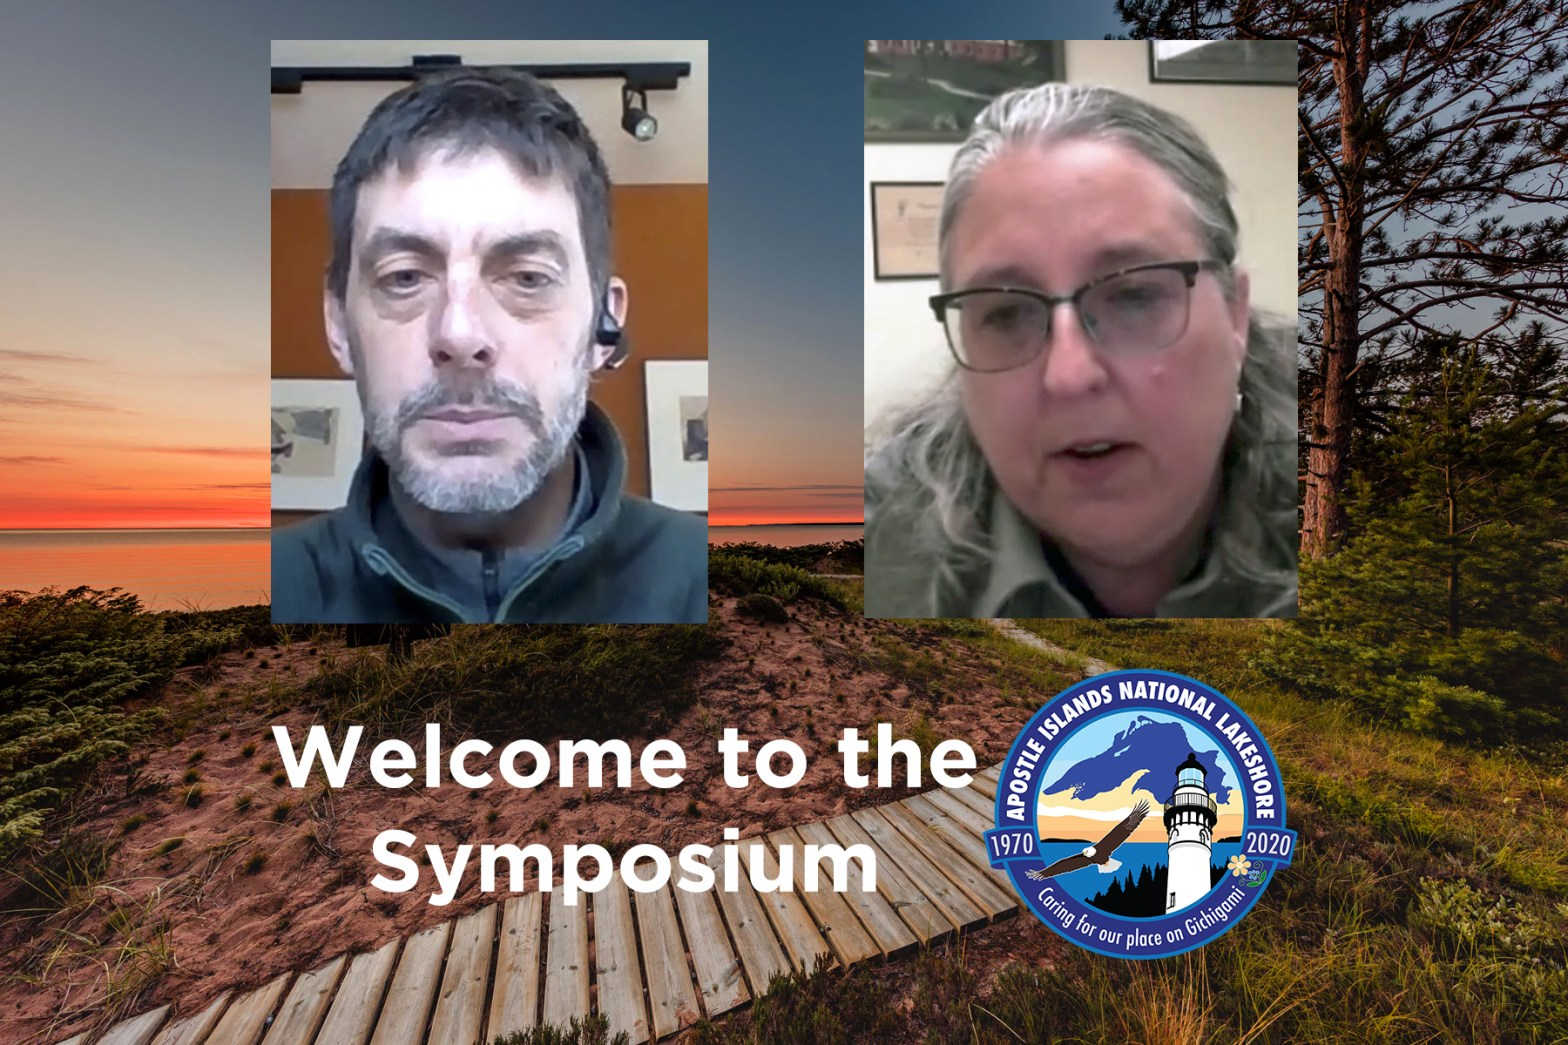 Symposium welcome